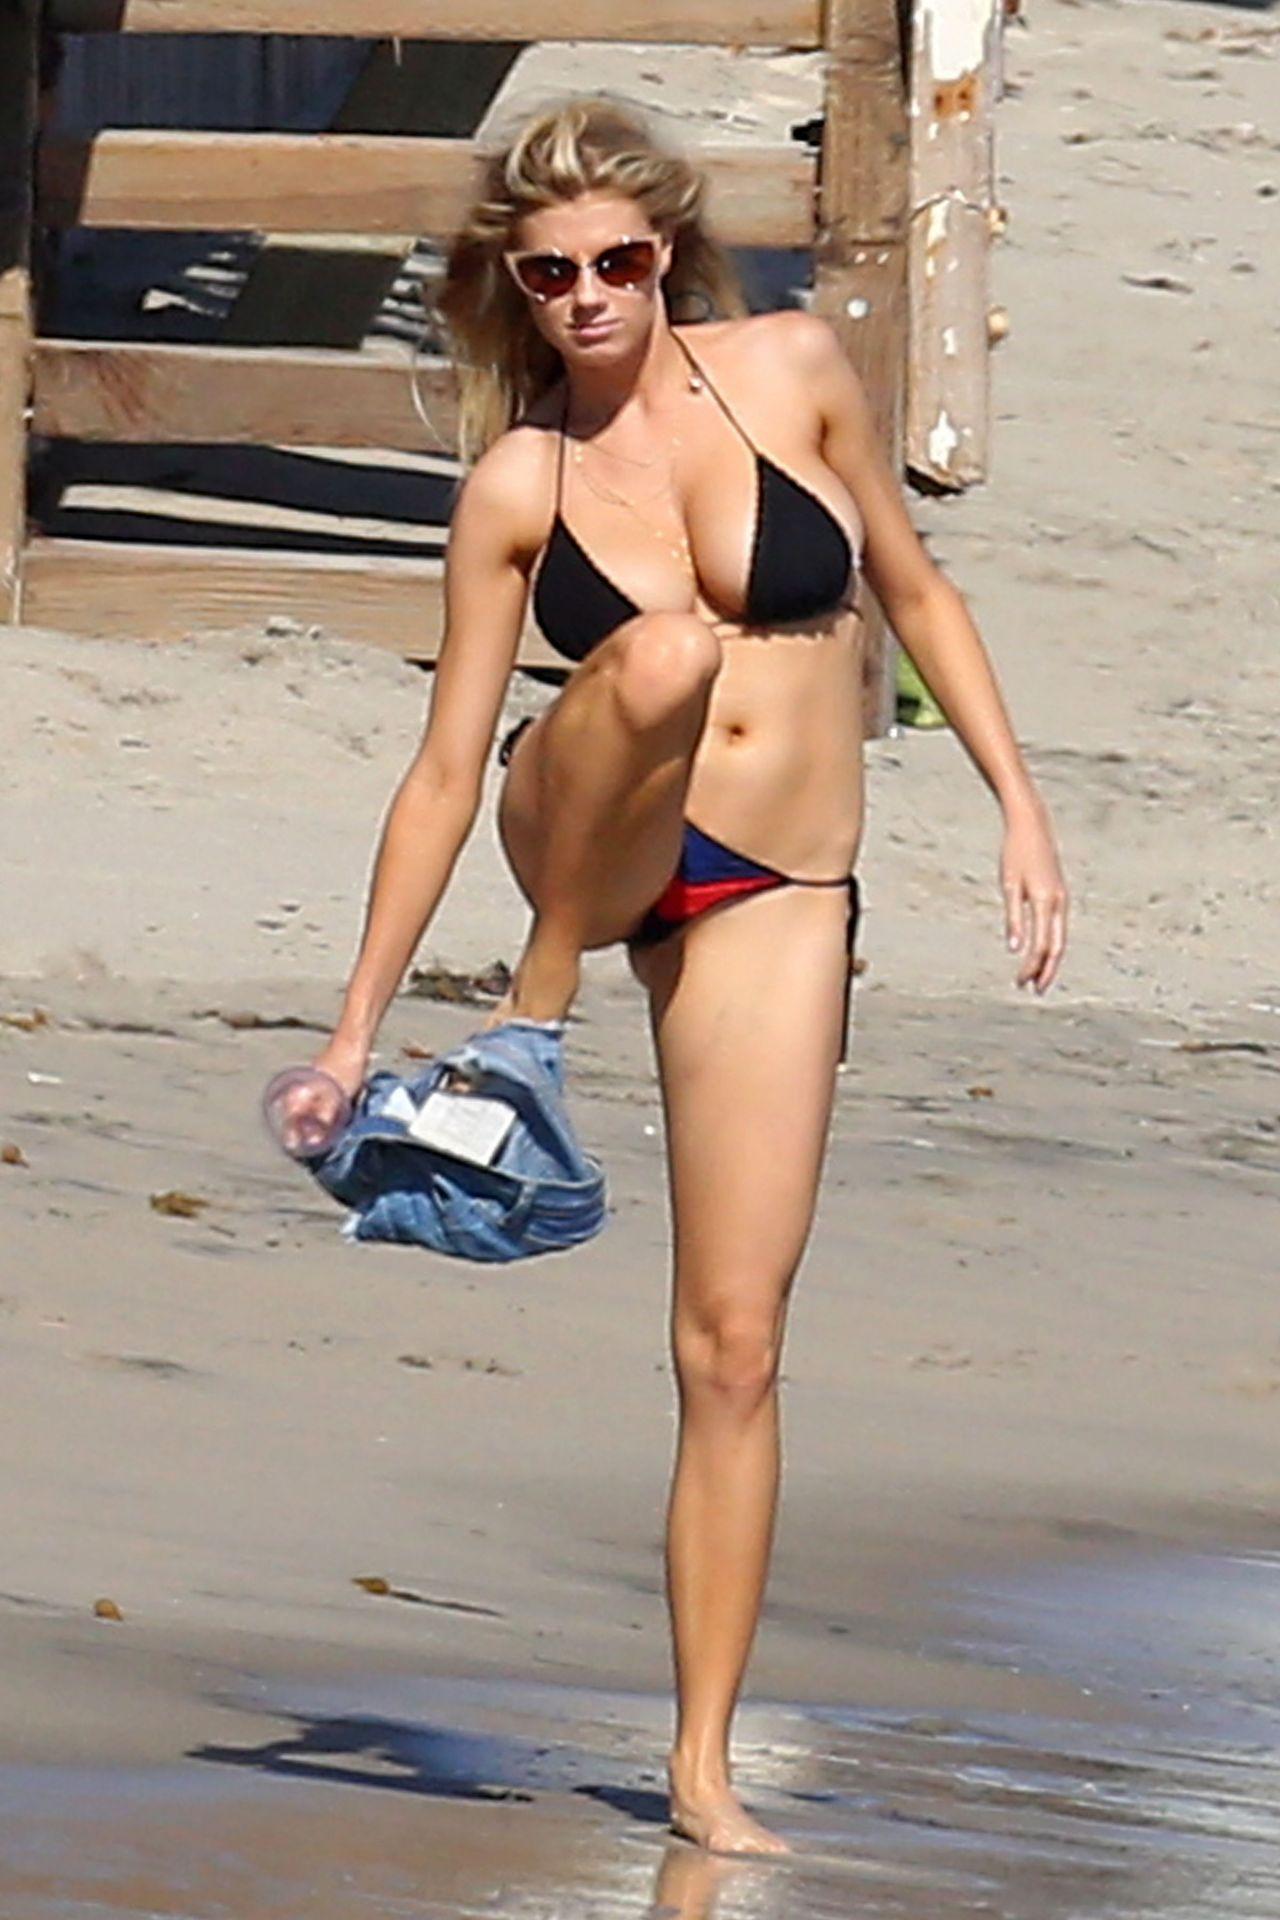 Bikini Slip At Beach